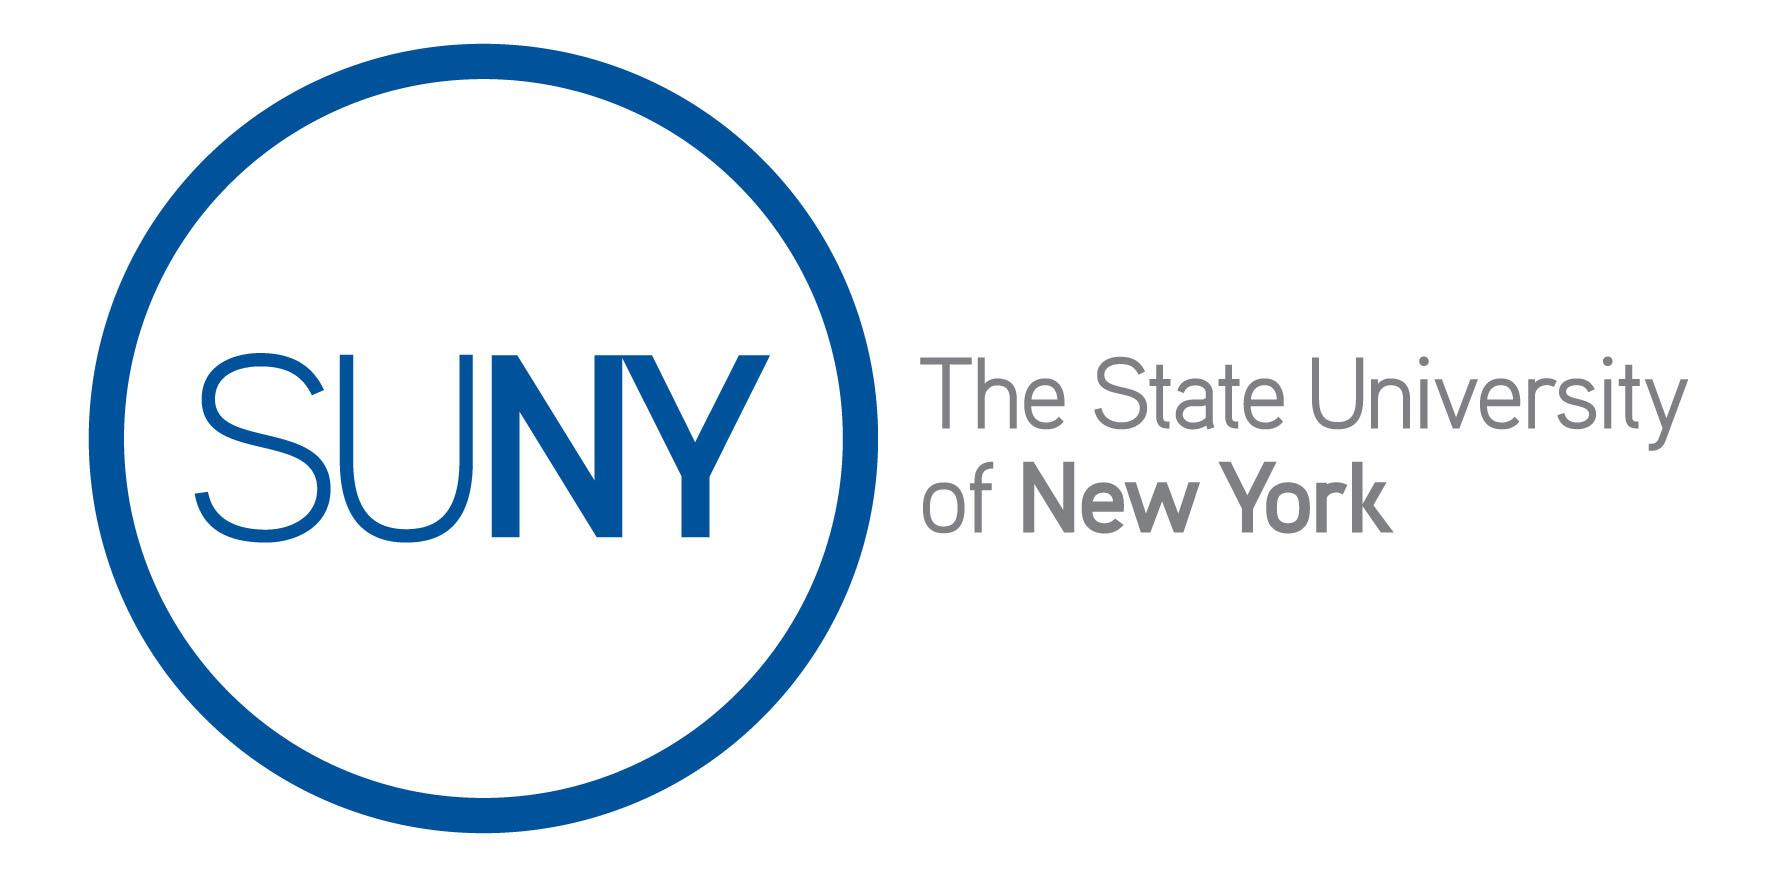 SUNY_Logo_278and424_1556033221340.jpg